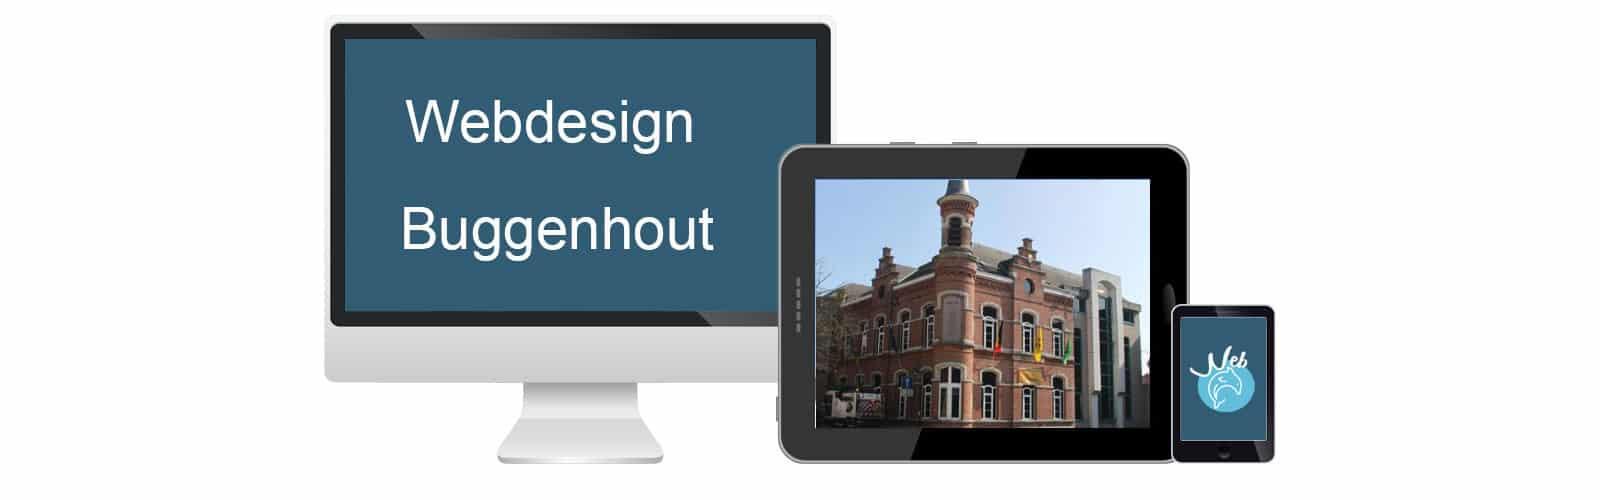 Webdesign buggenhout - webdolfijn